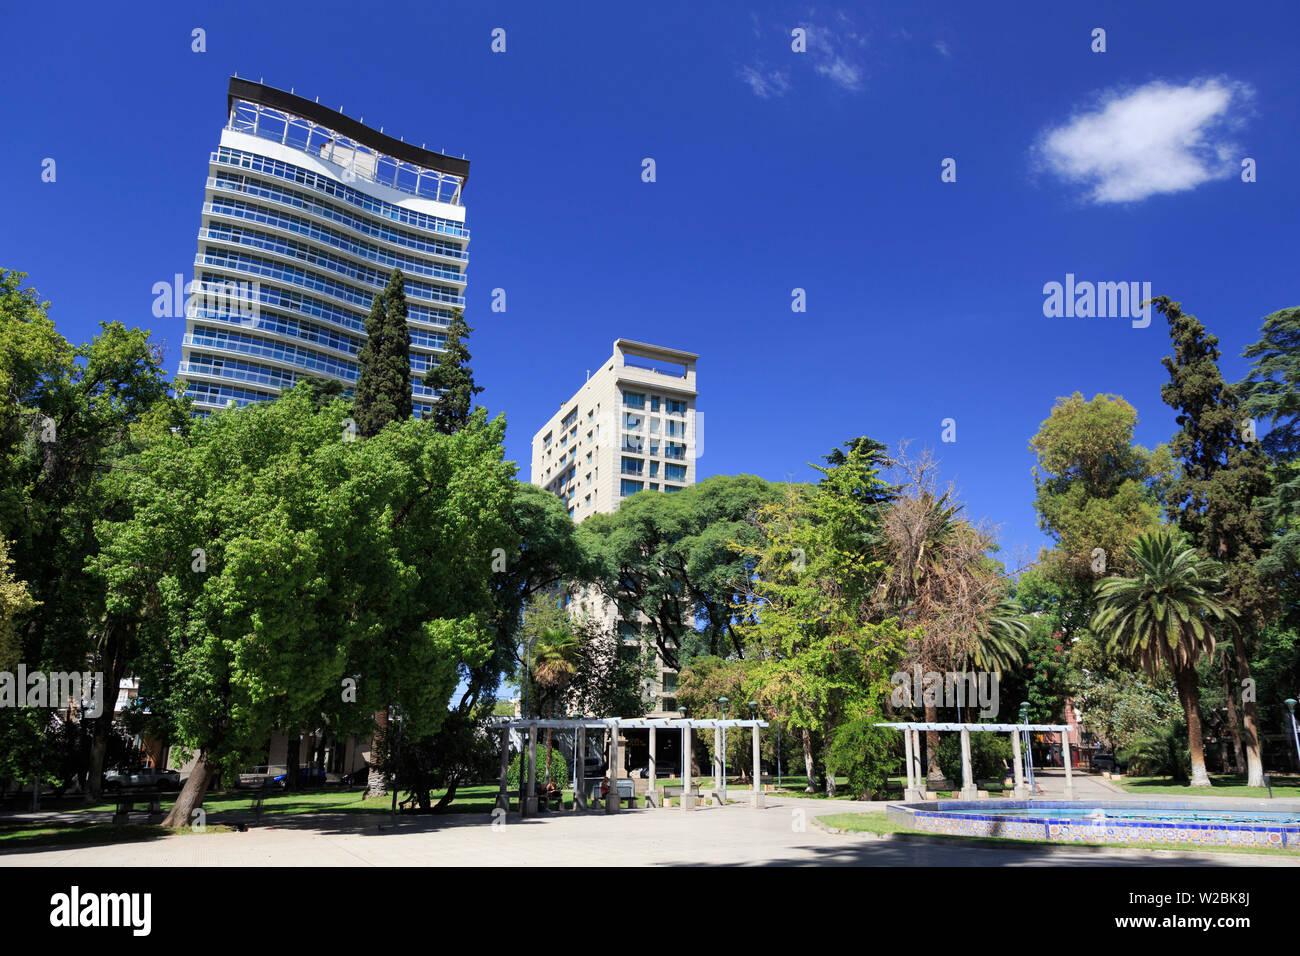 Argentina, Mendoza, Plaza Italia - Stock Image